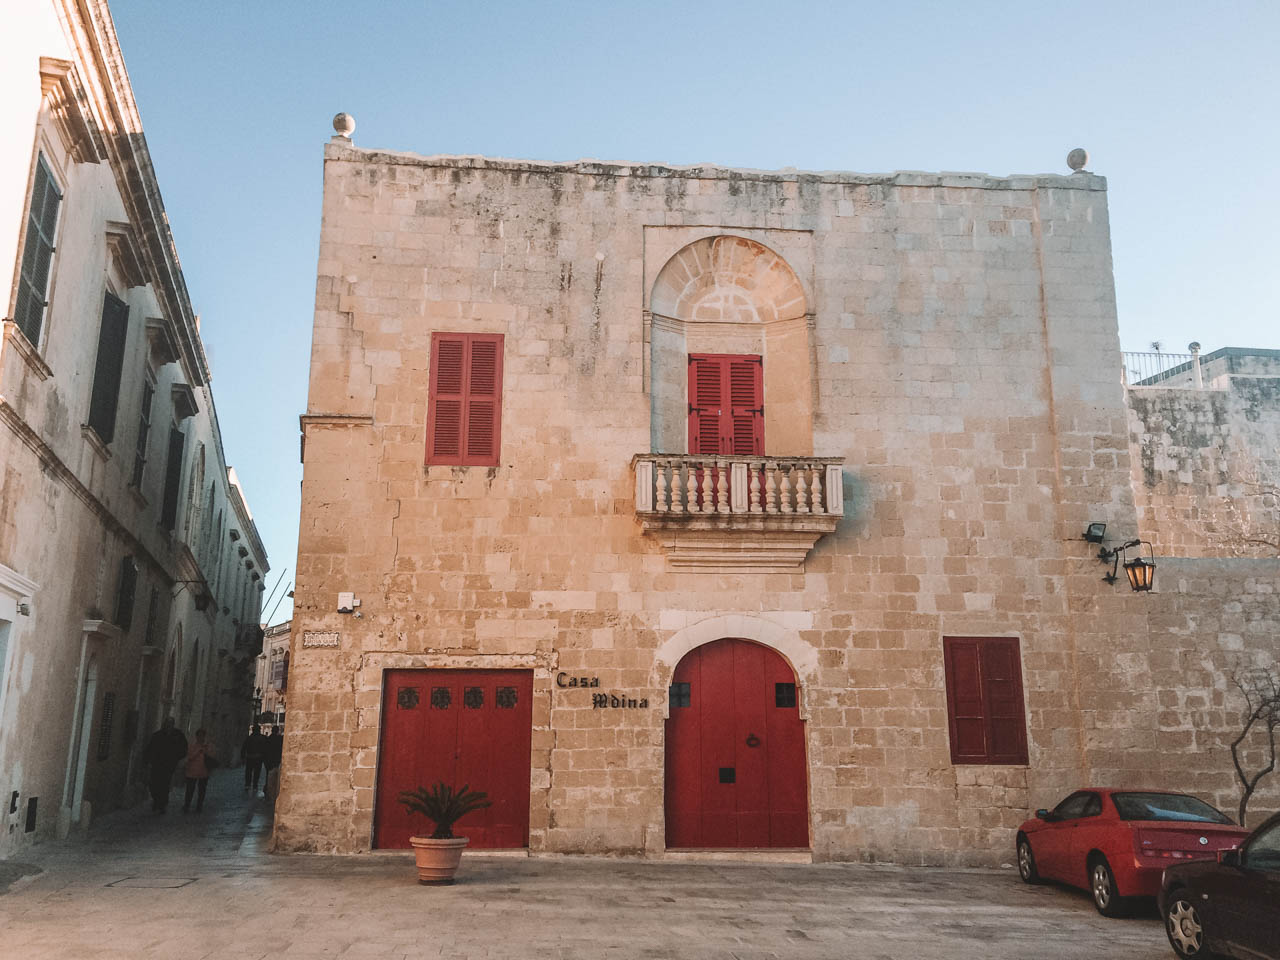 The outside of Casa Mdina in Mdina, Malta